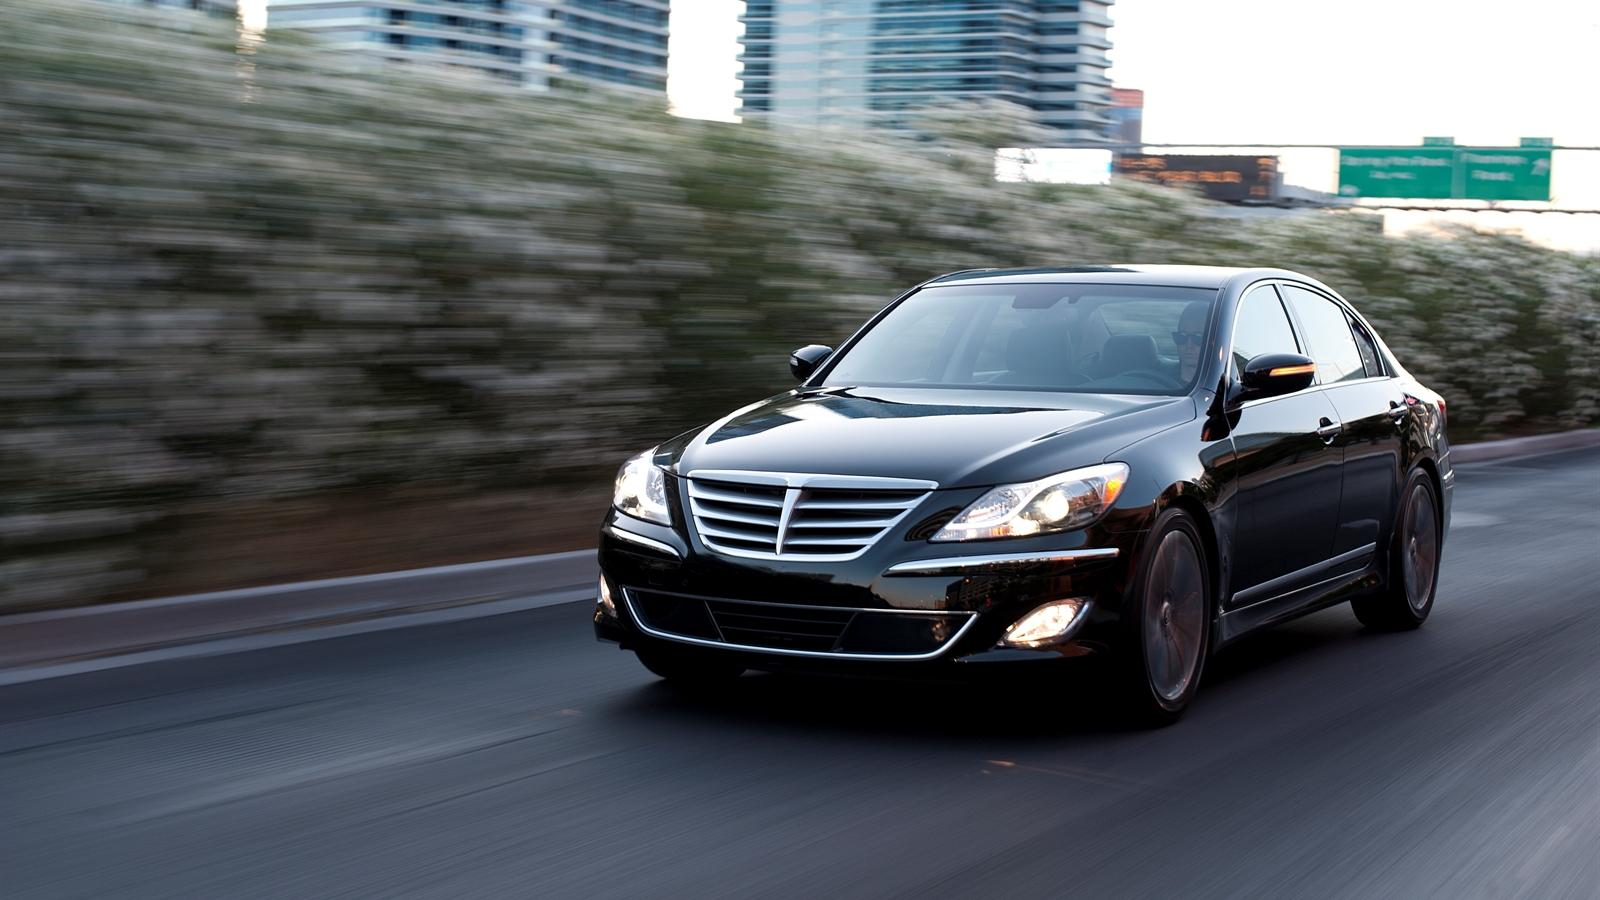 2014 Hyundai Genesis